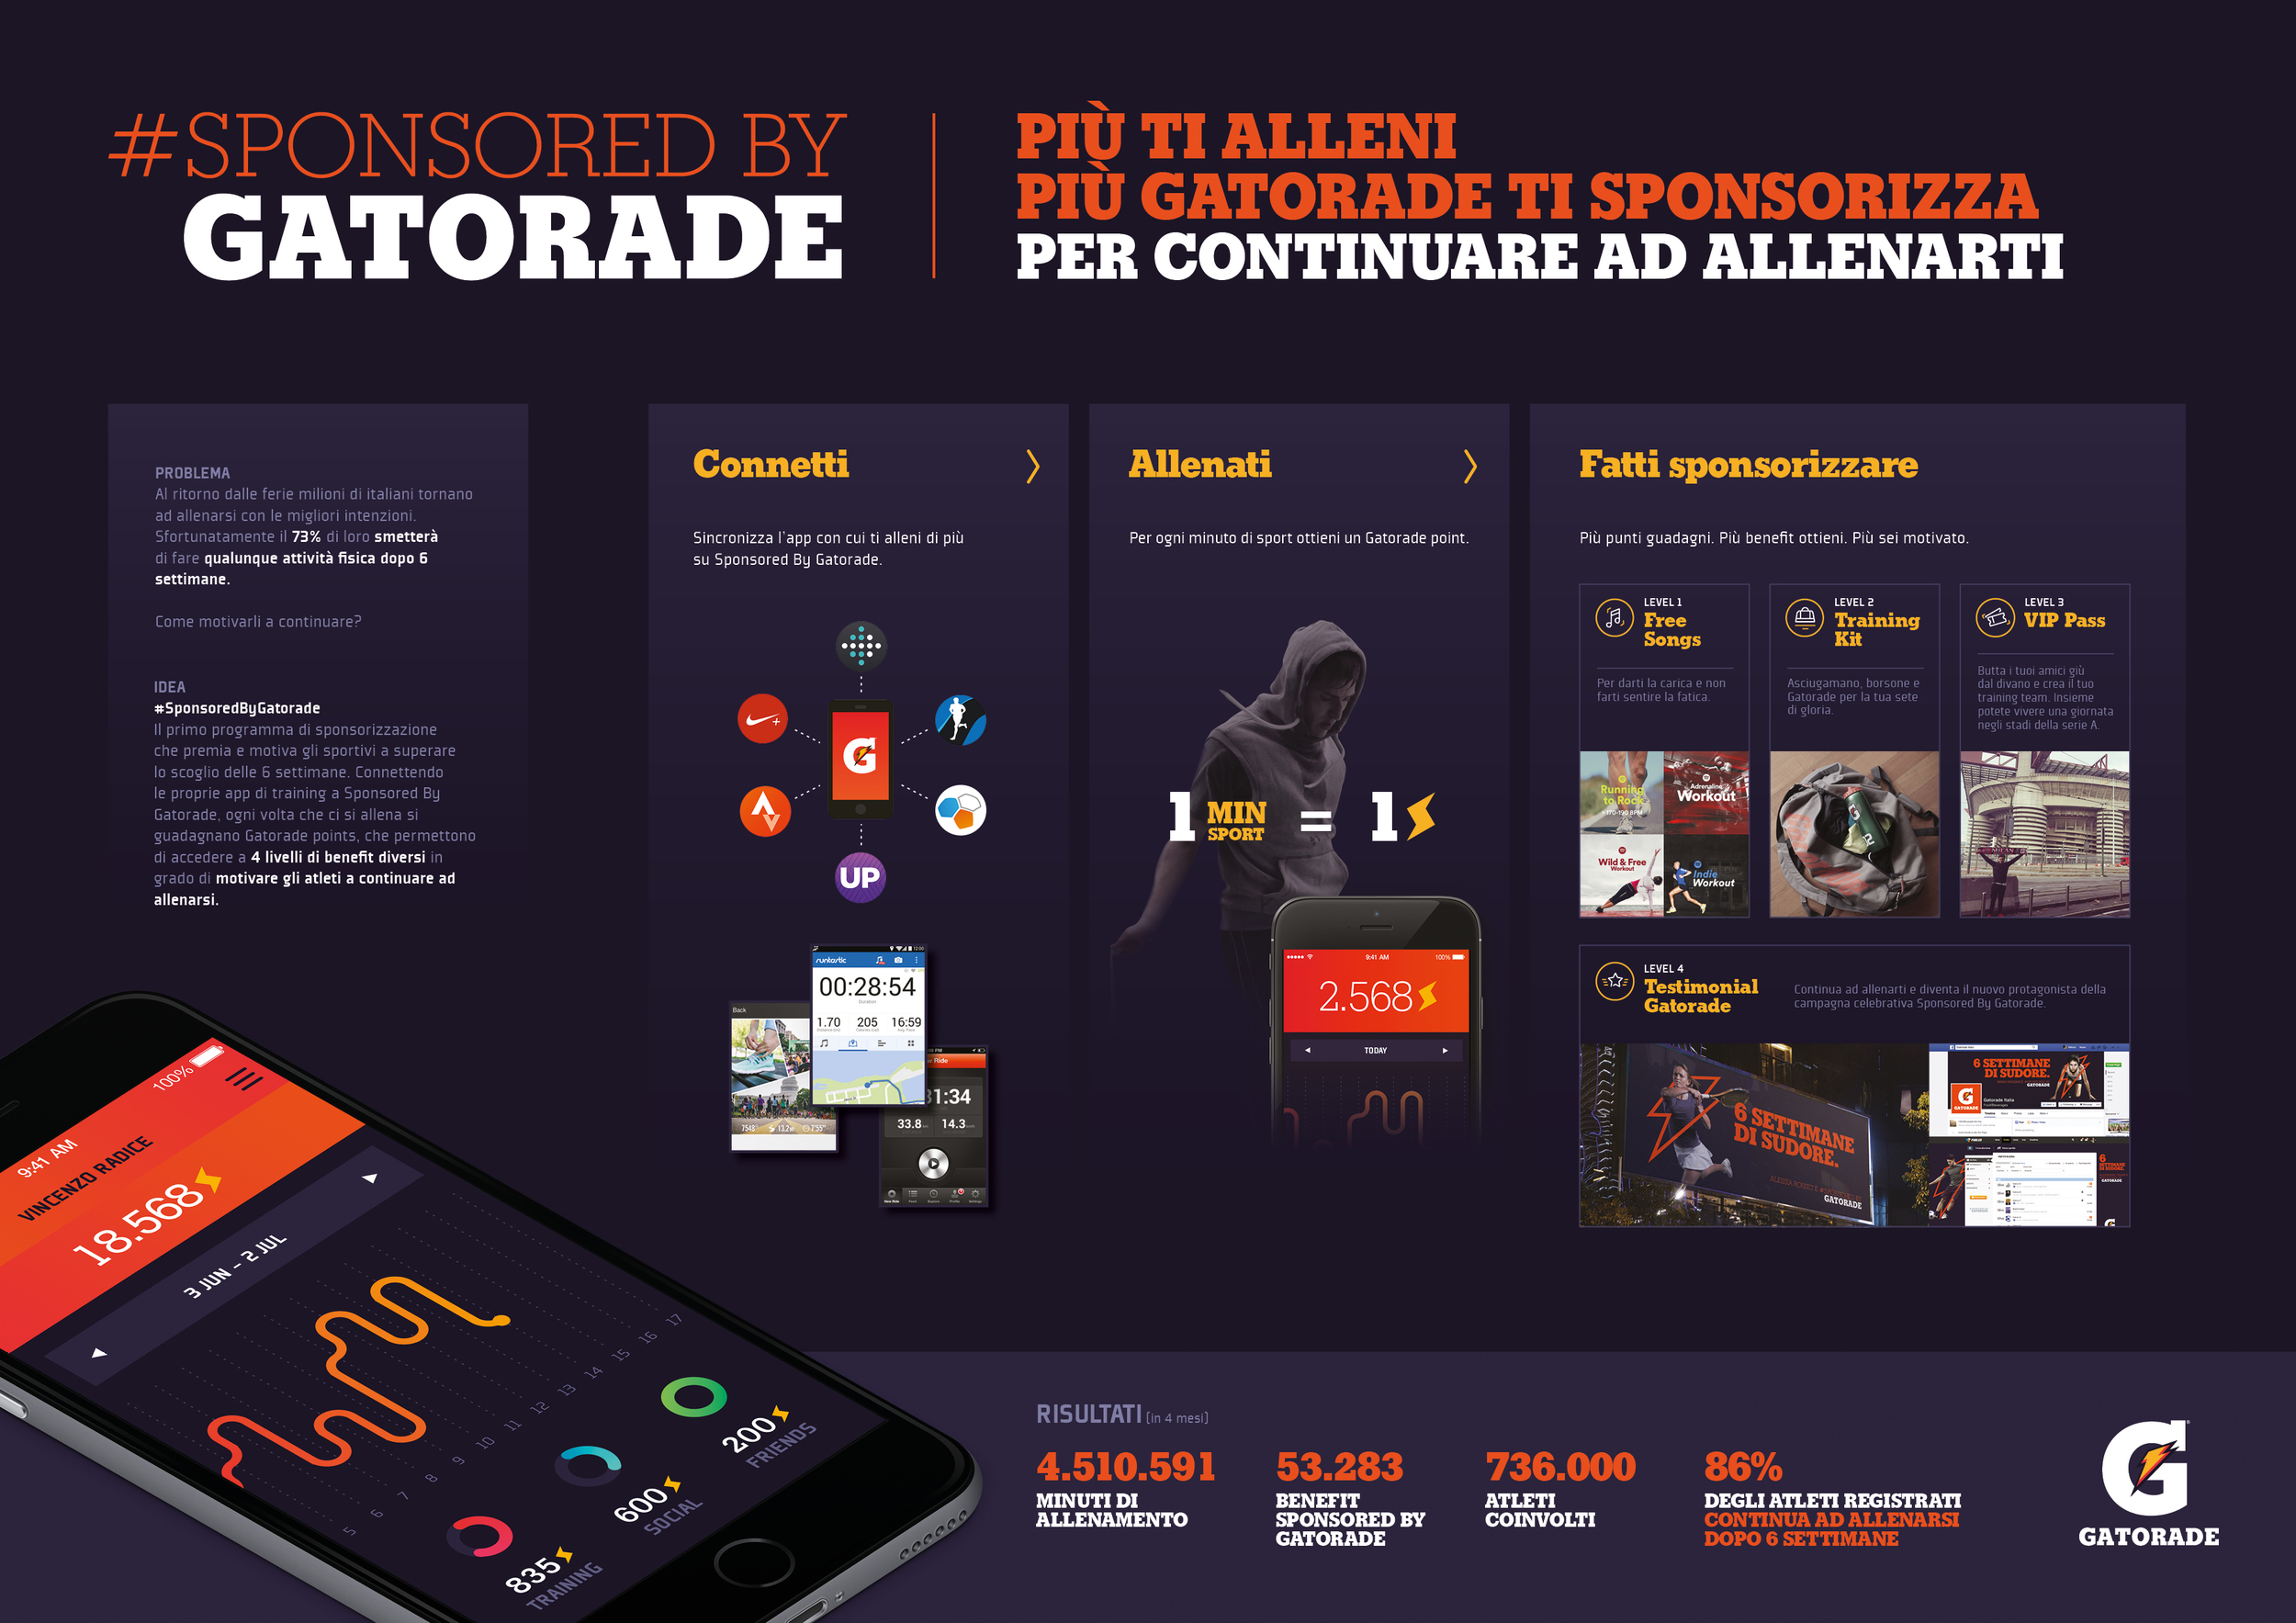 A2board_SponsoredByGatorade_ITA.jpg